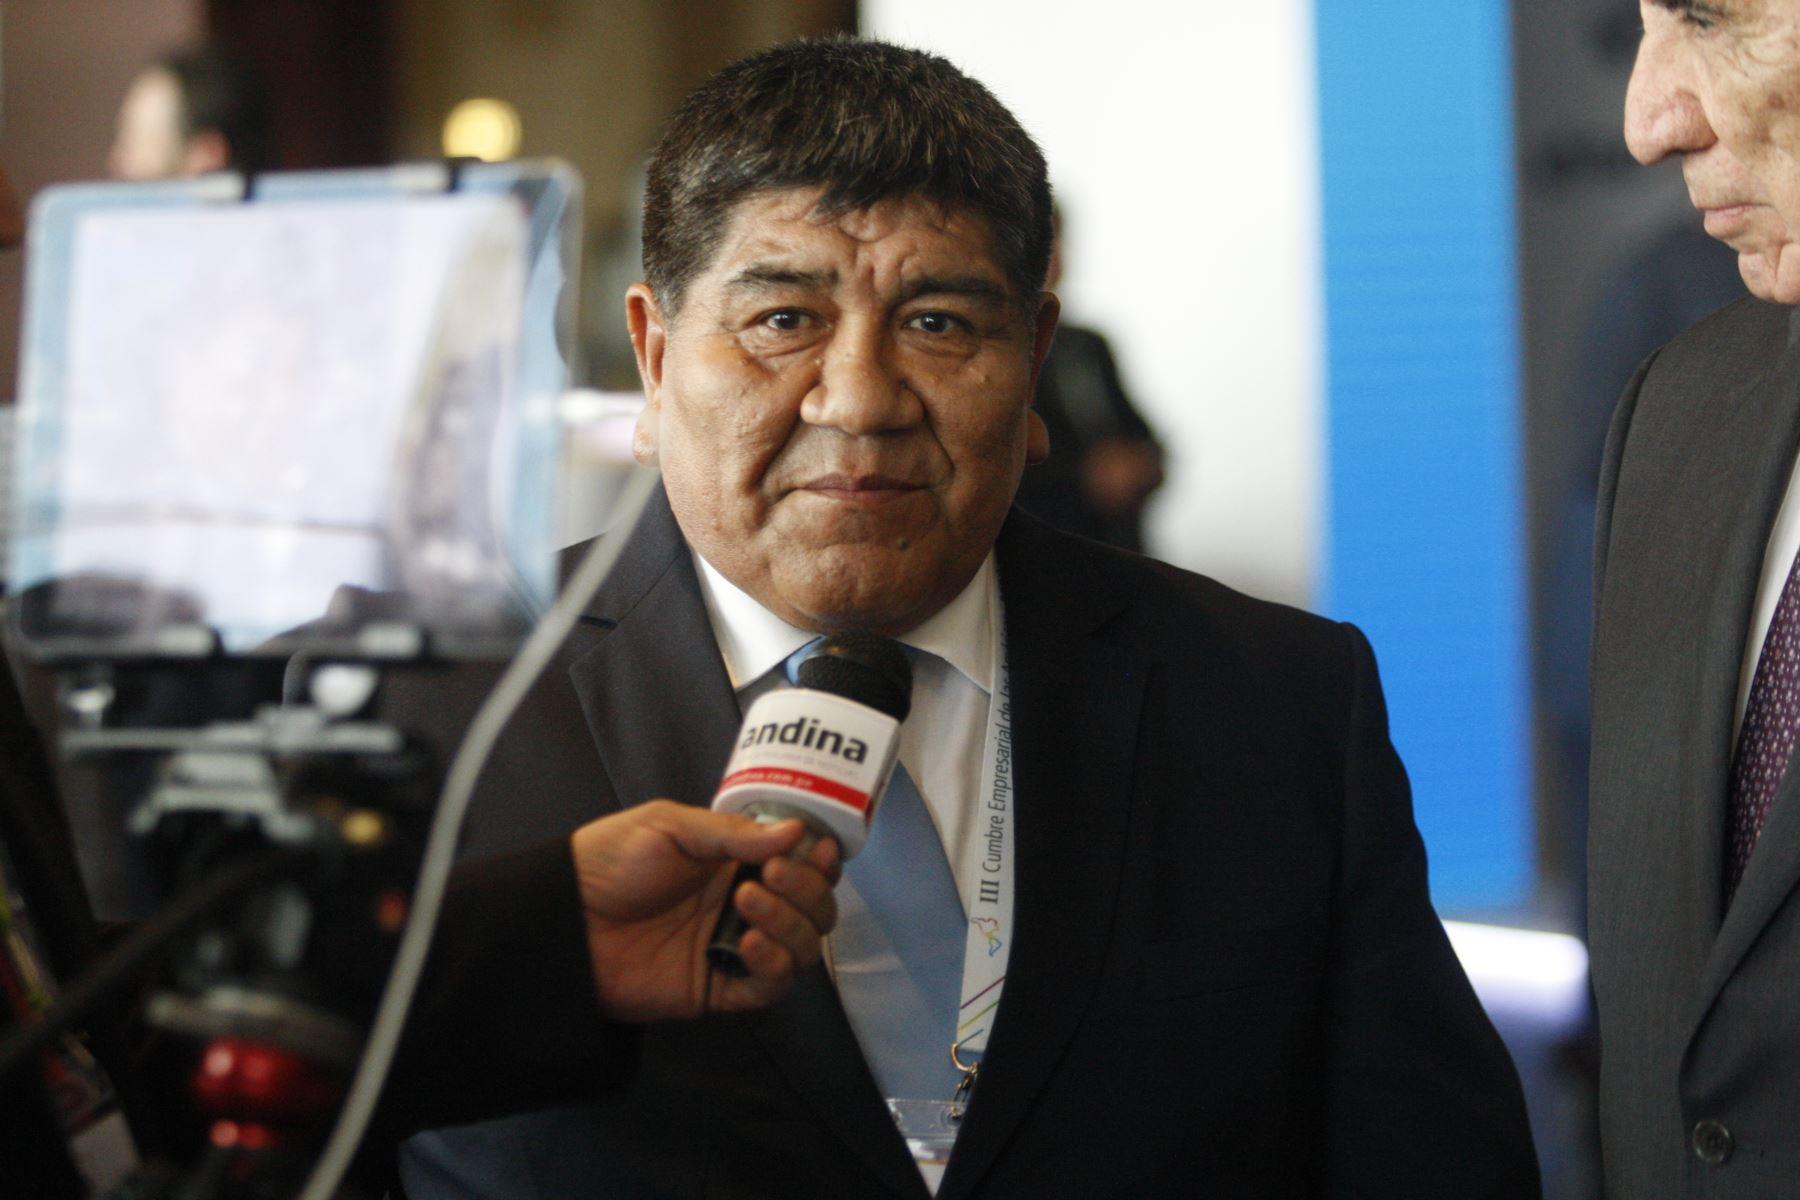 Rómulo Mucho. ANDINA/Eddy Ramos